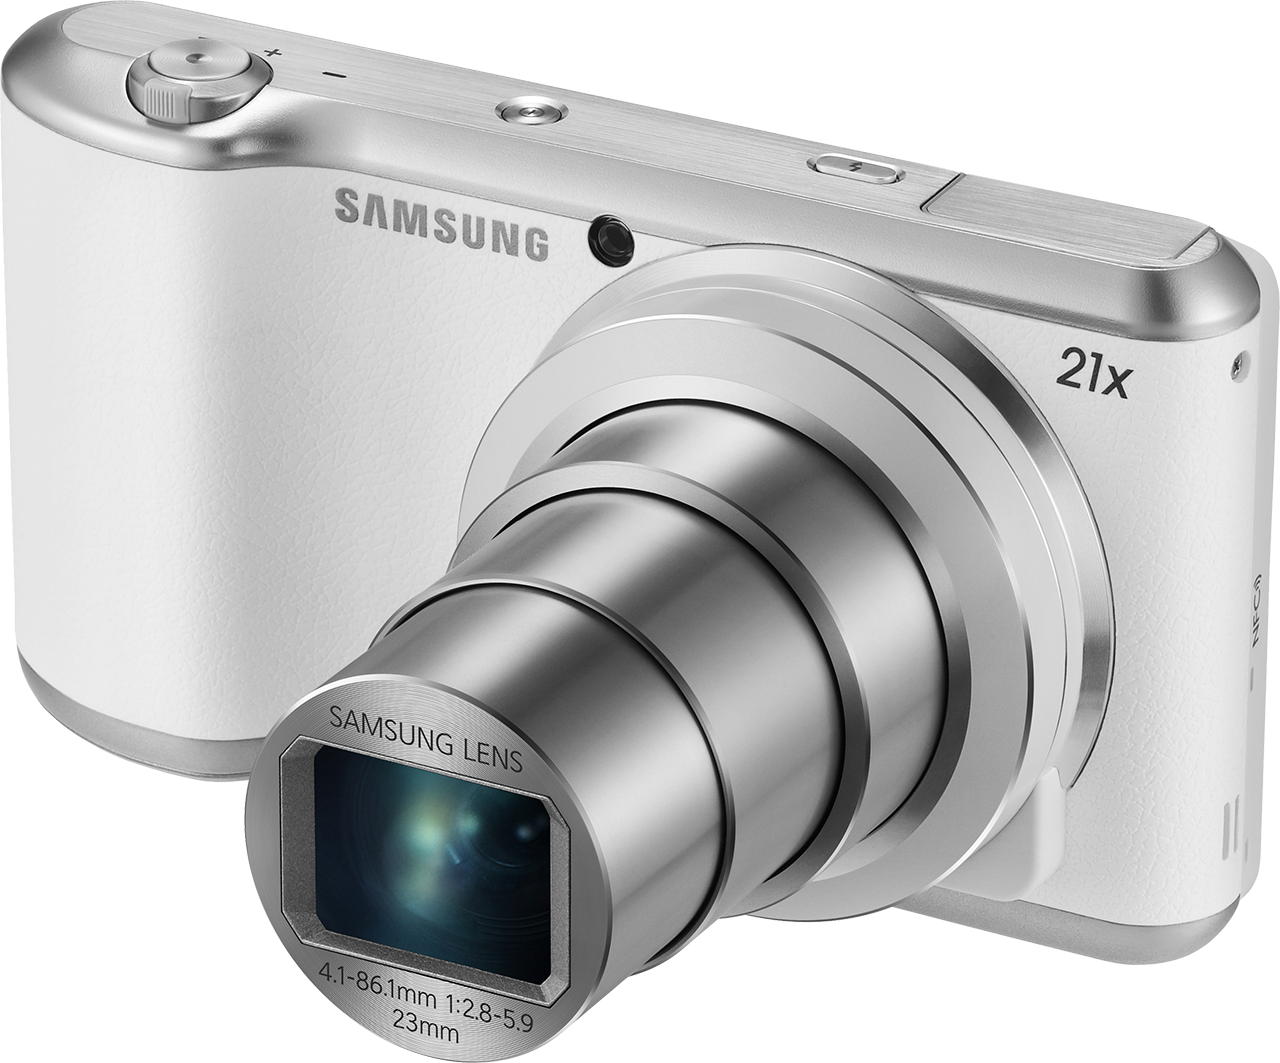 Samsung Galaxy Camera 2: Digital Photography Review